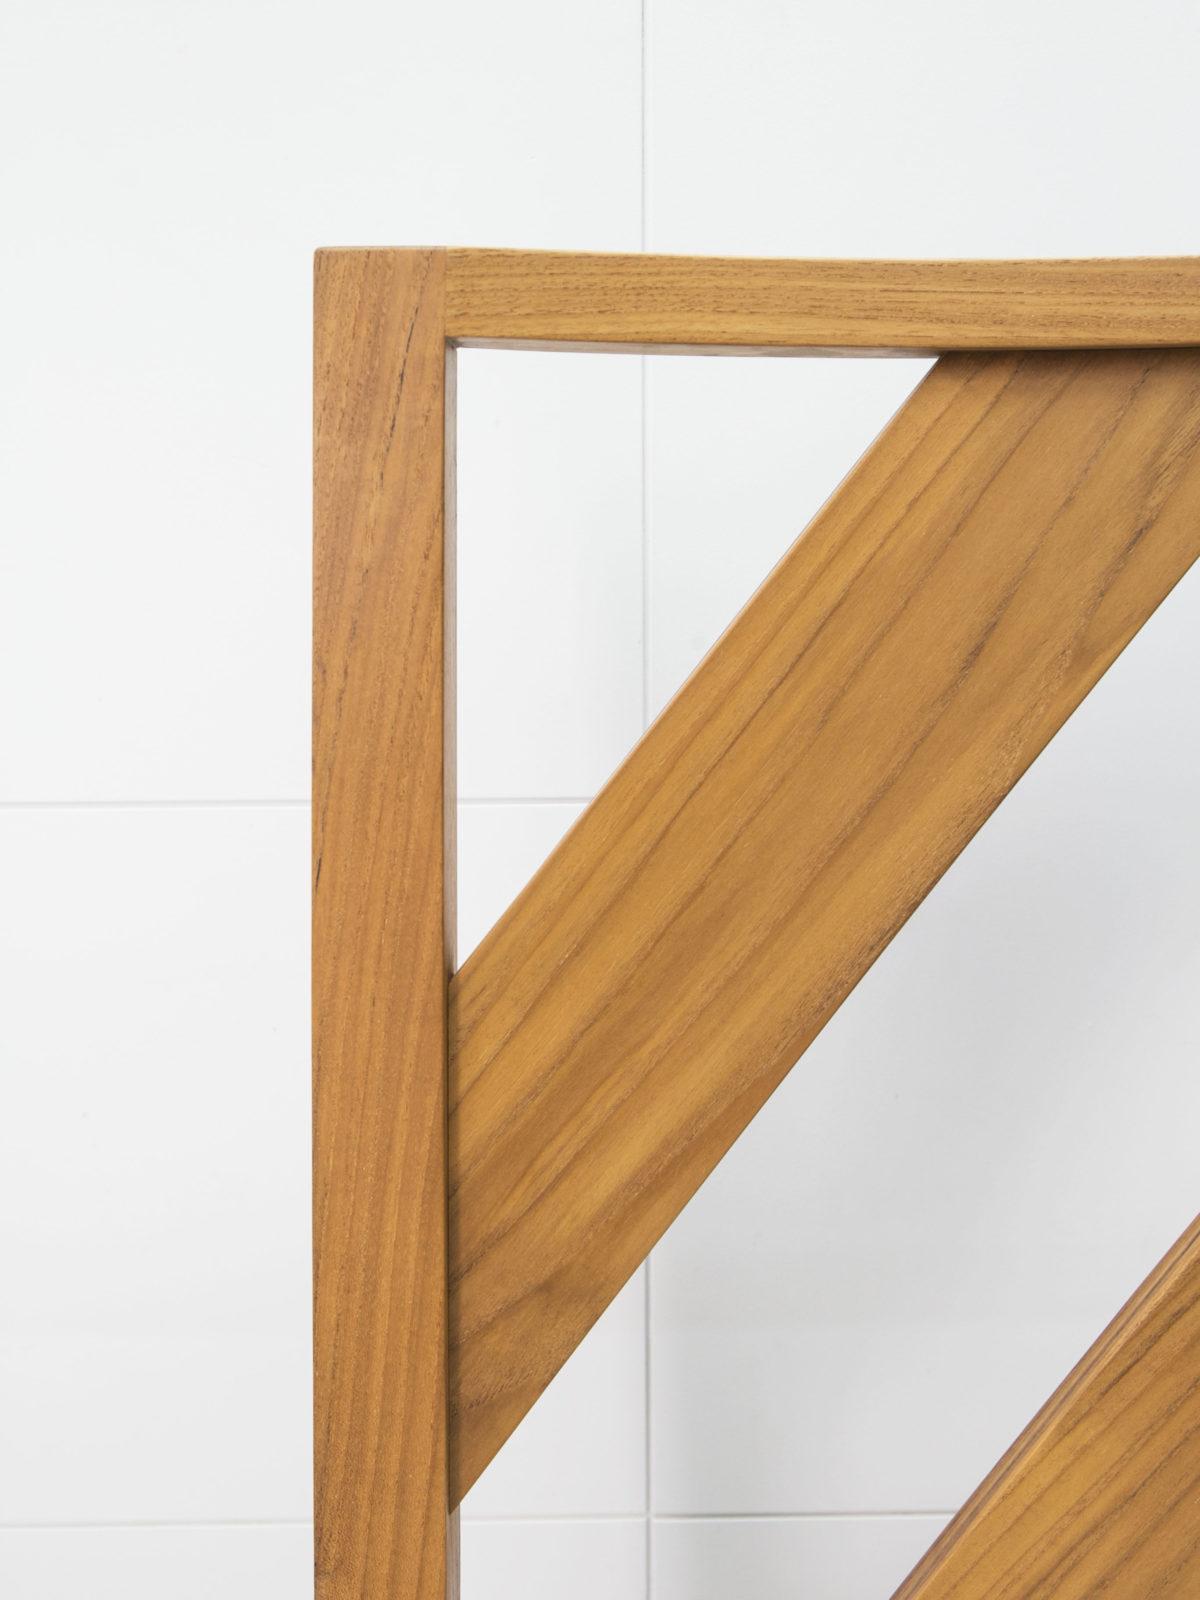 solid teak chair back detail